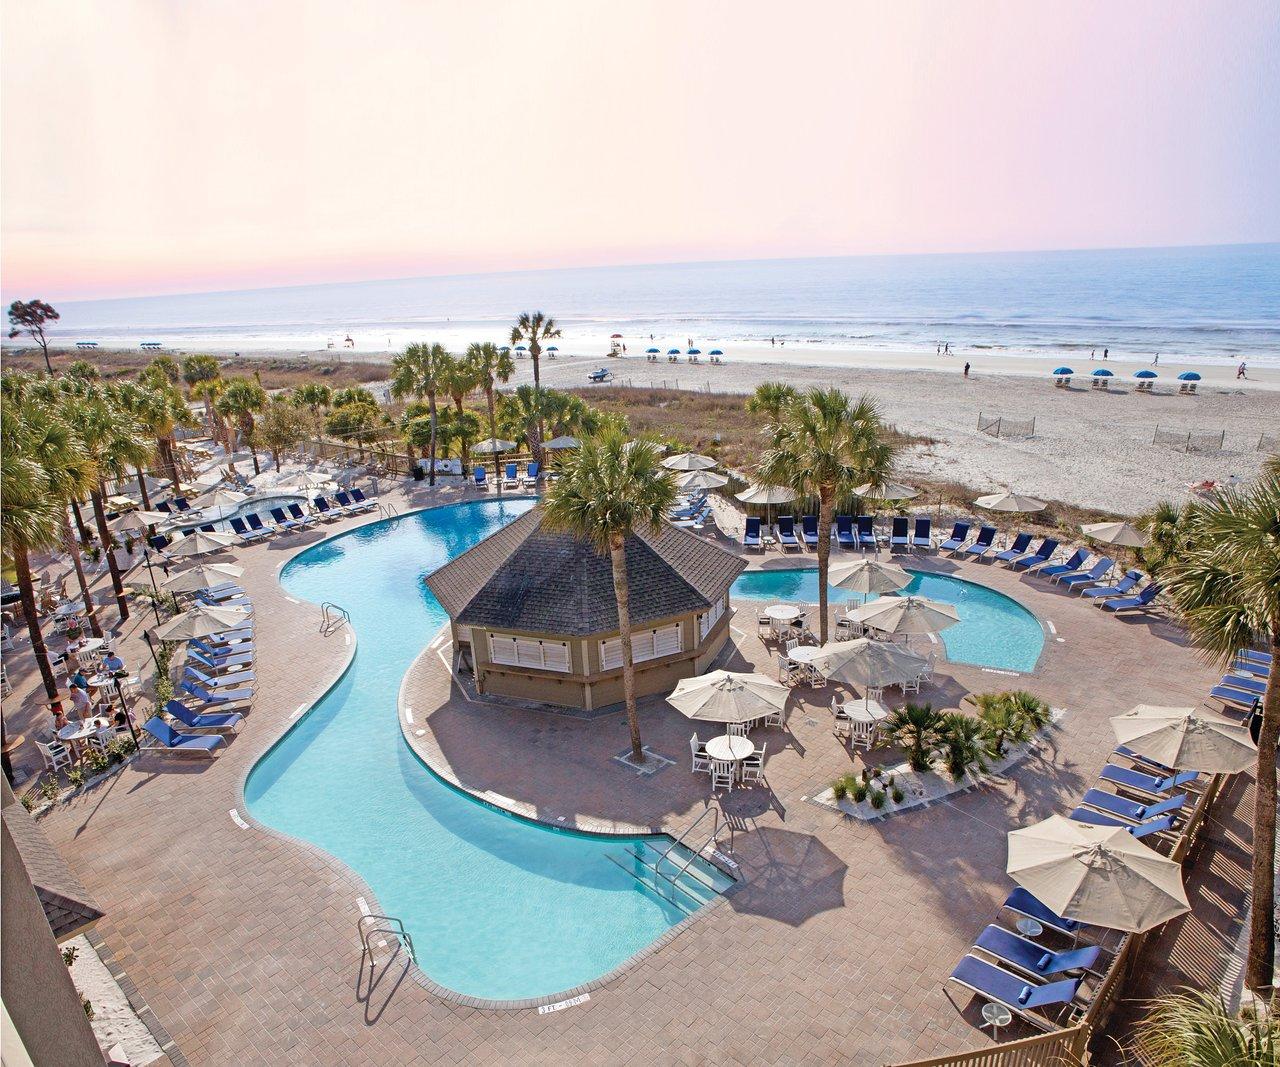 Book 10 Best Hotels In Hilton Head Sc For 2019 From 95 Tripadvisor